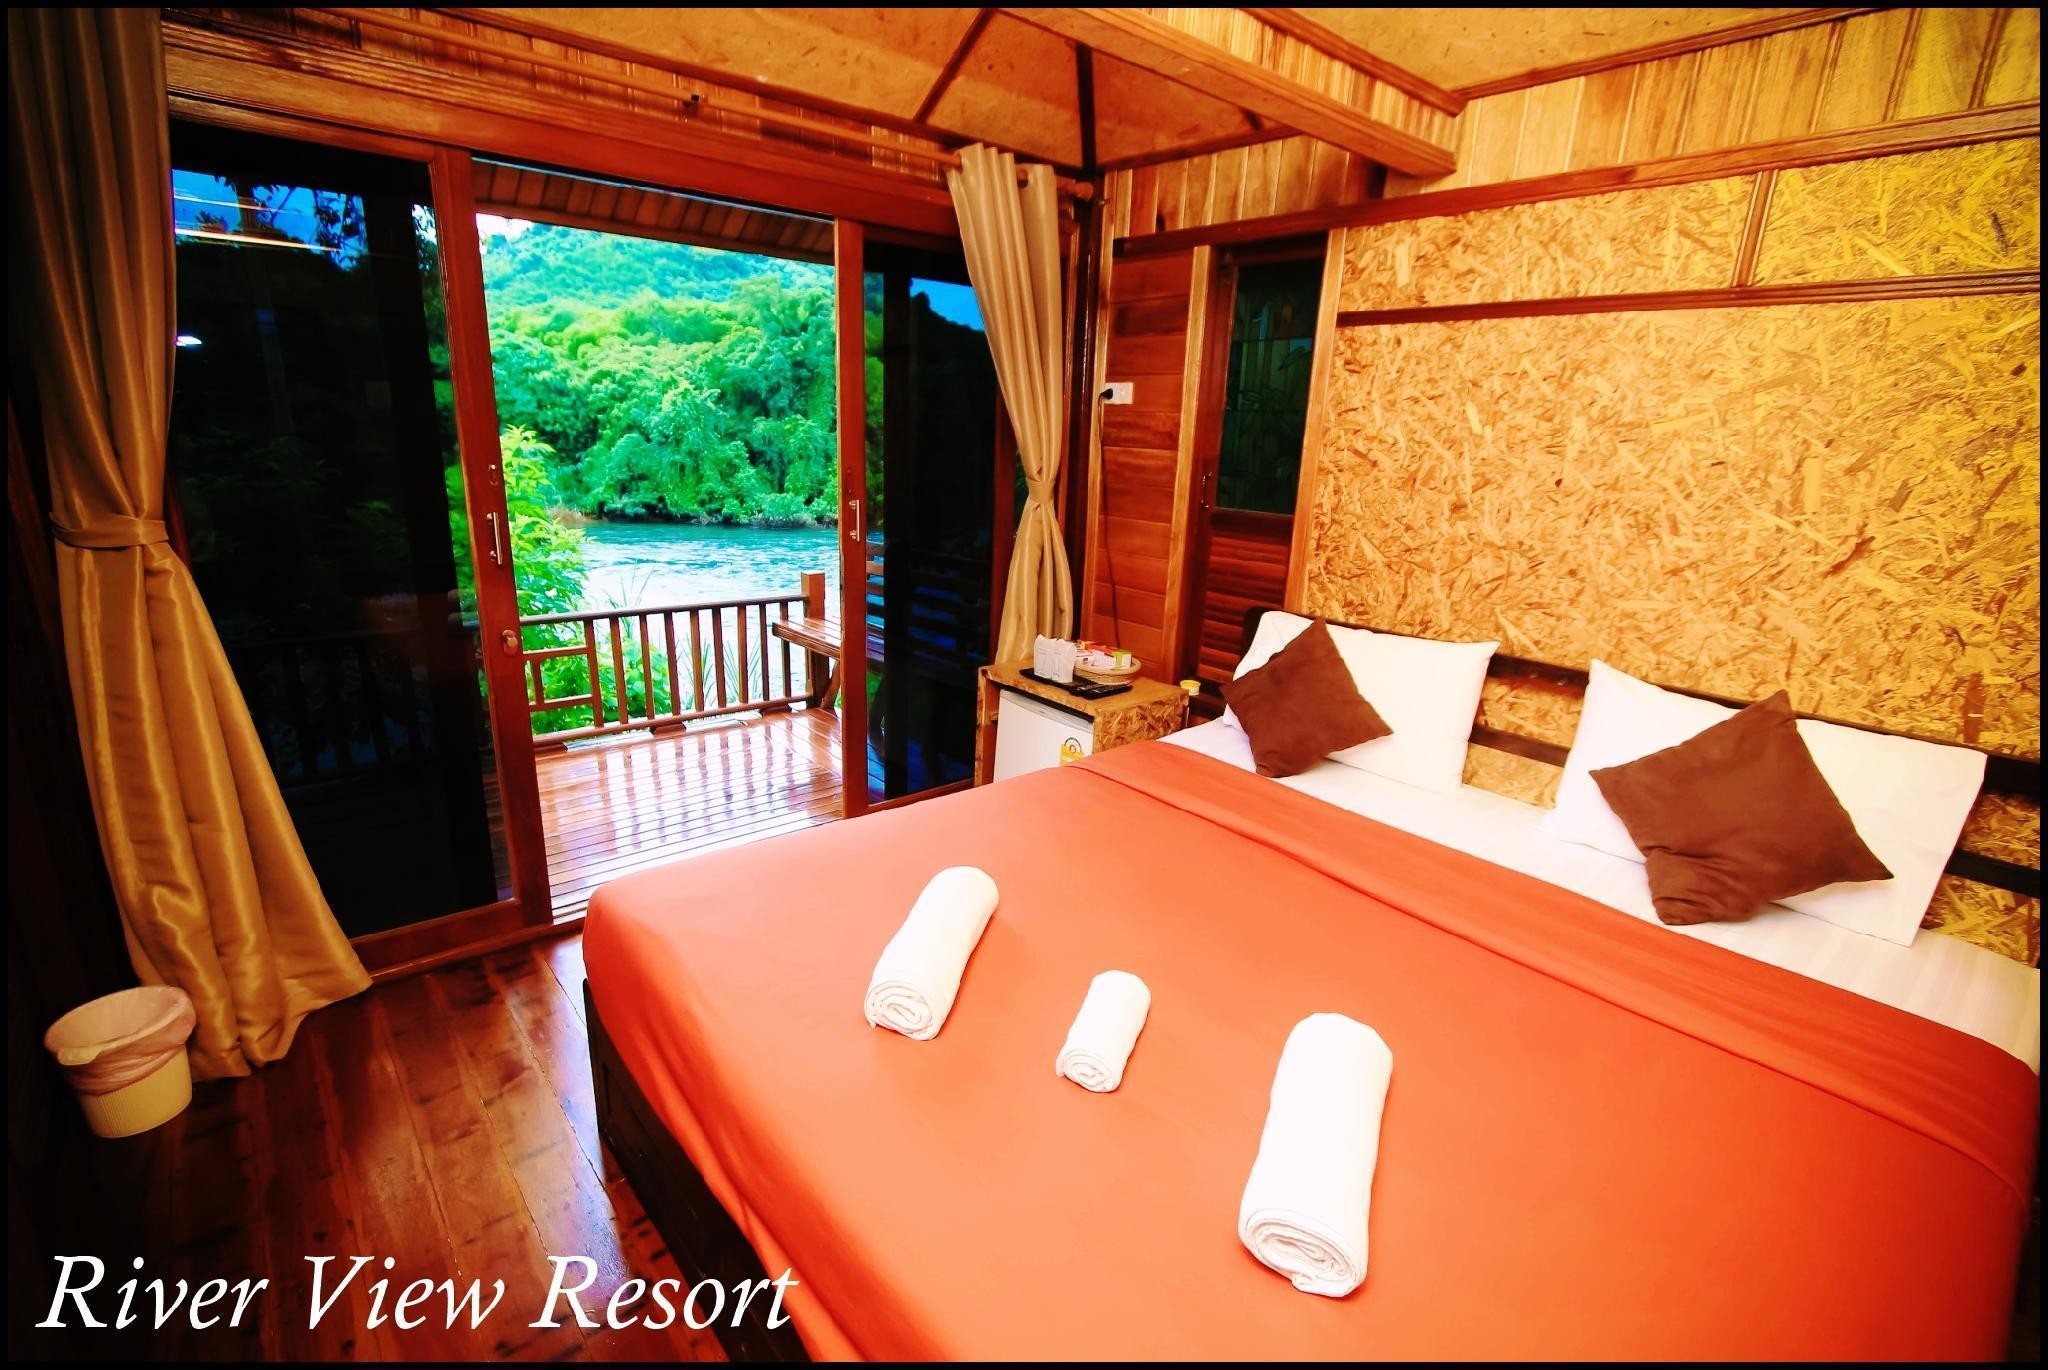 River View Resort At Chaewlan ริเวอร์วิว รีสอร์ท แอท เชี่ยวหลาน